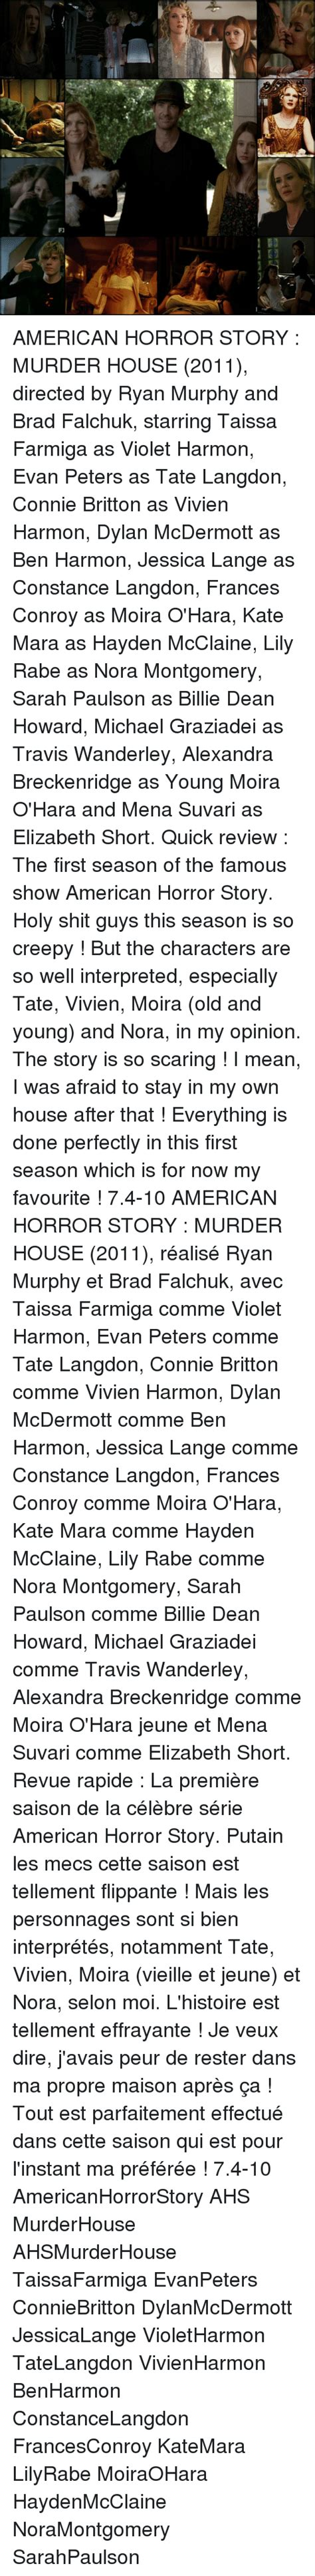 American Horror Story Murders House by 25 Best Memes About Elizabeth Elizabeth Memes